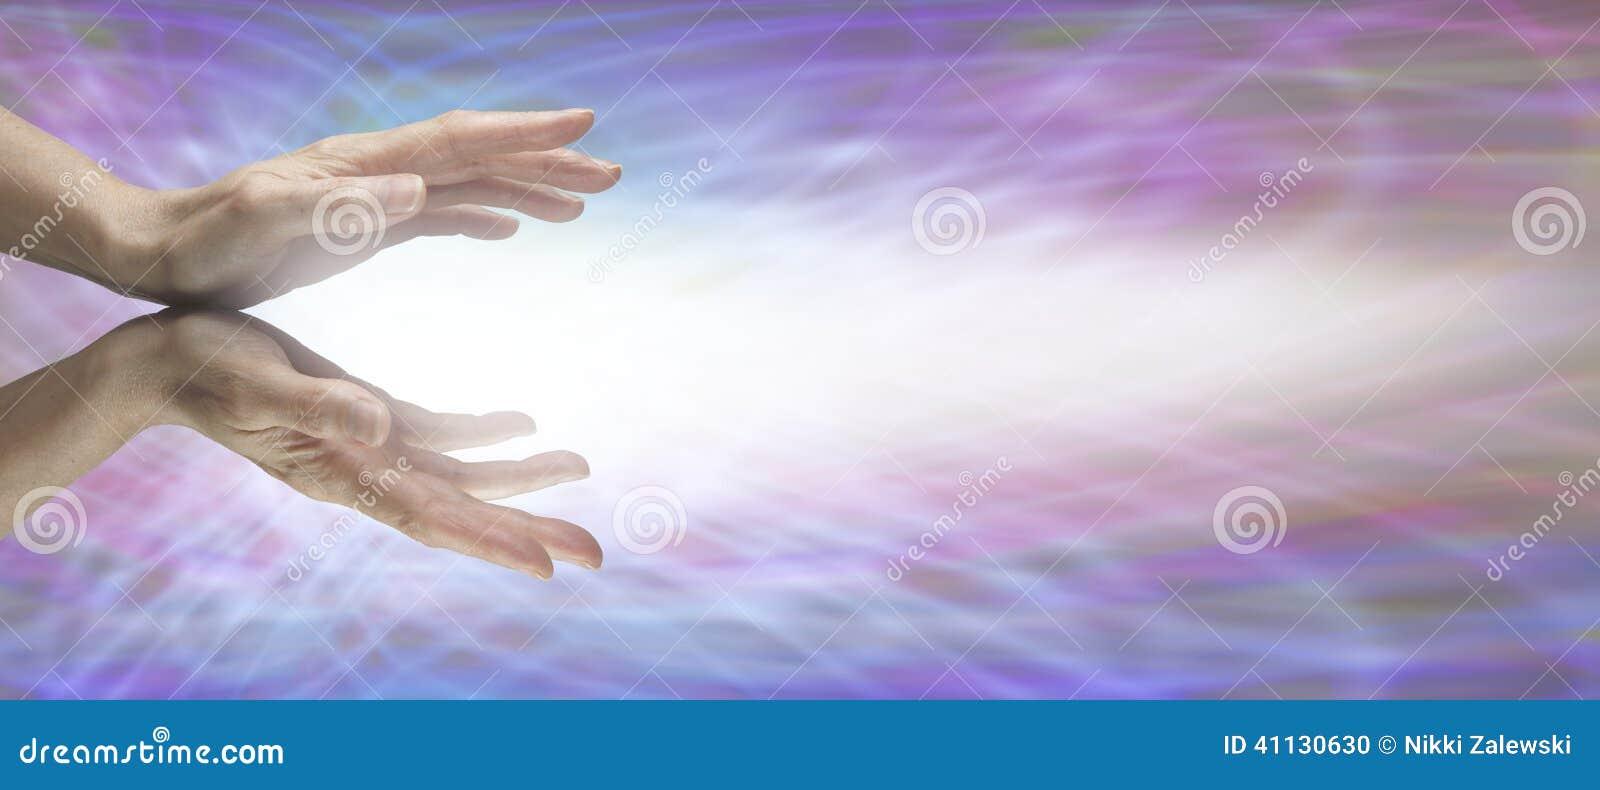 Healing Hands On Matrix Website Banner Stock Illustration